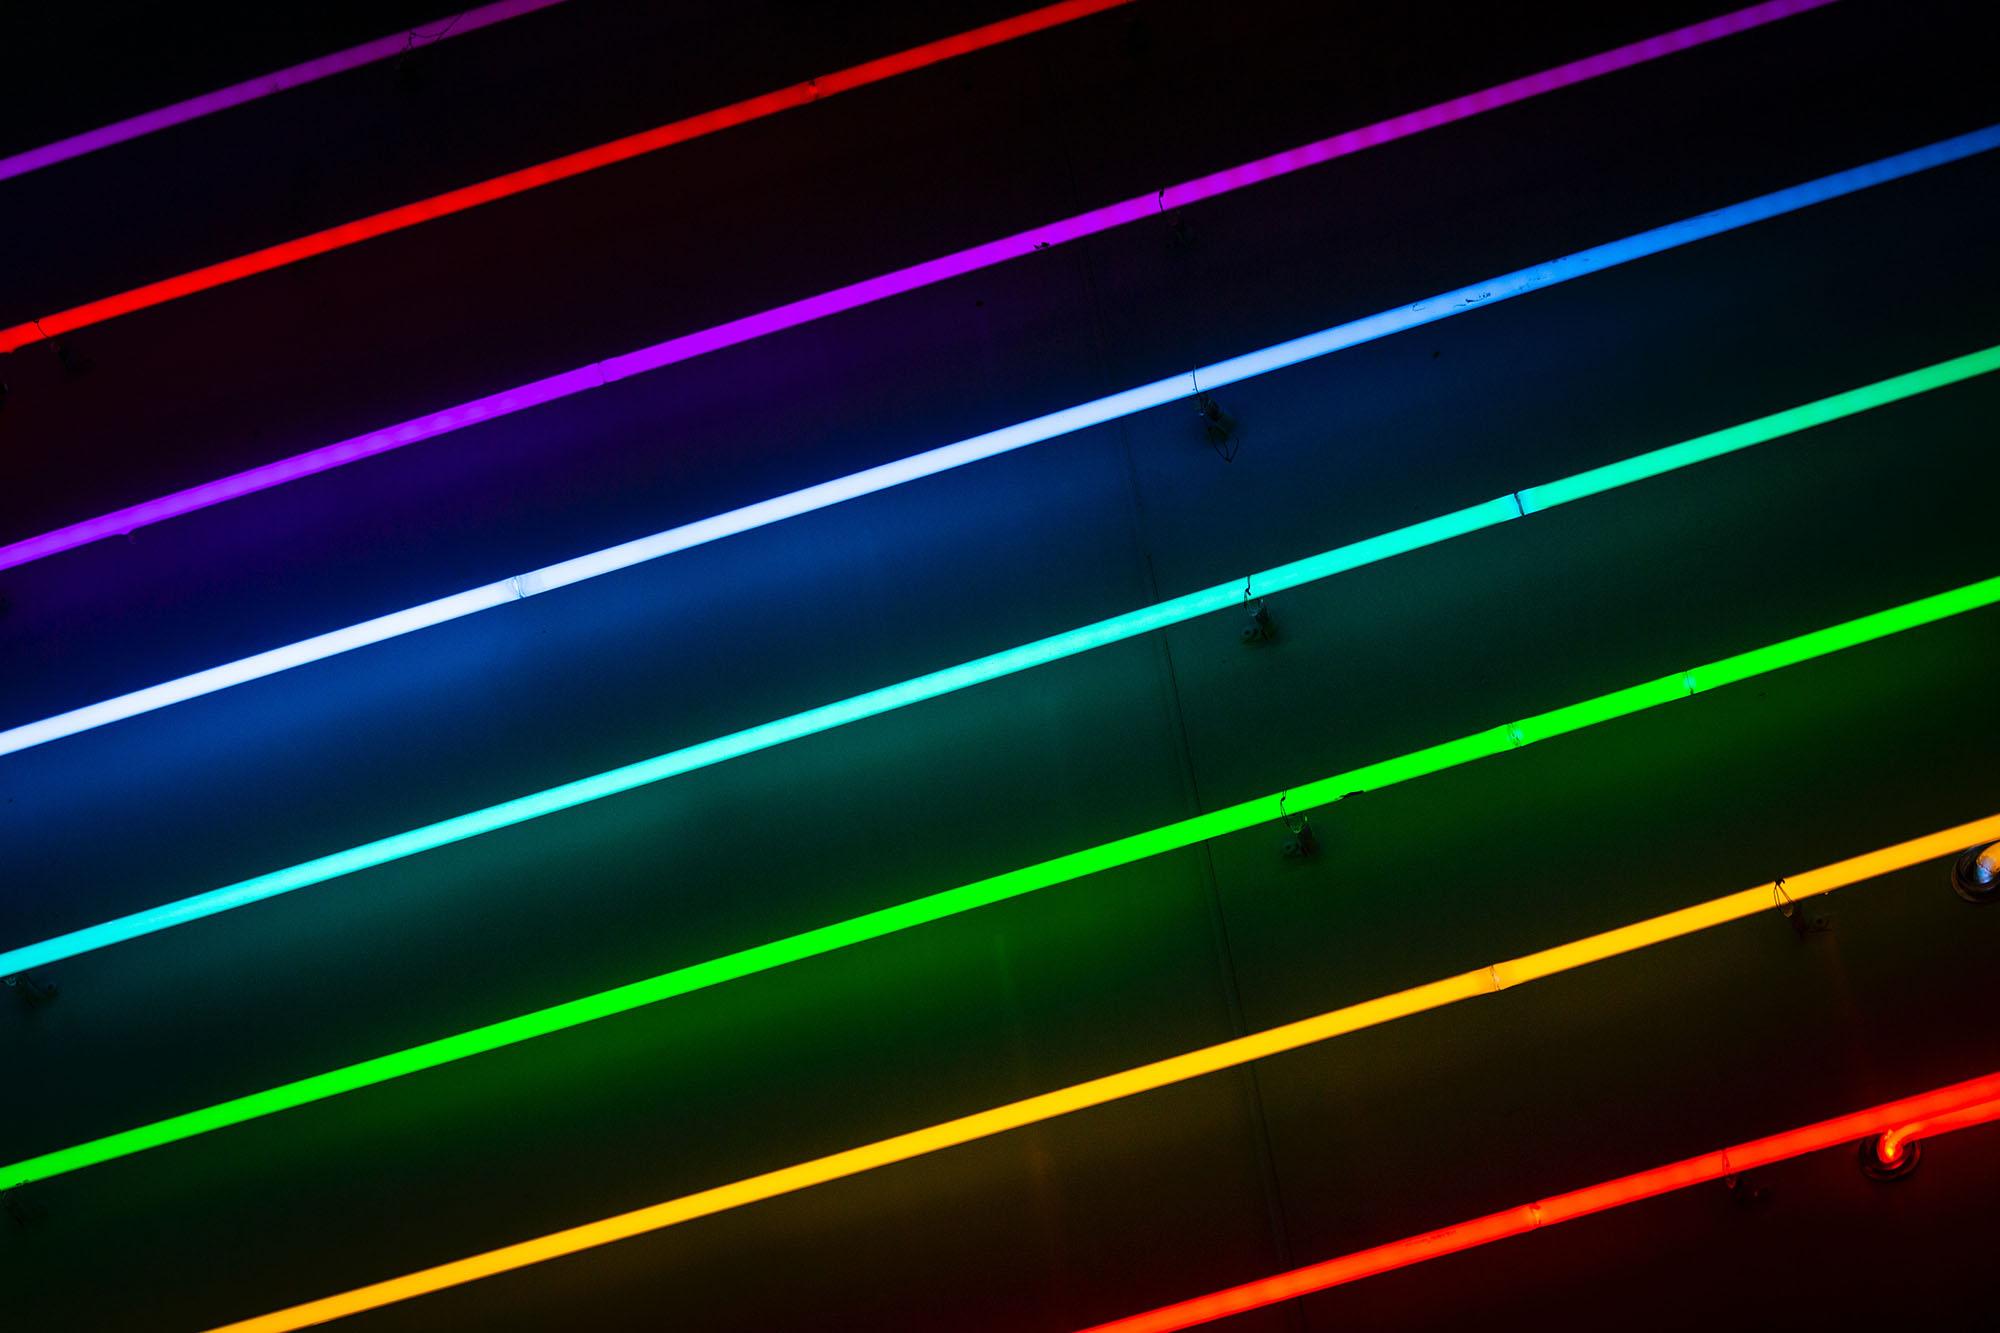 Feature photo by Drew Beamer/Unsplash. Rainbow lights.